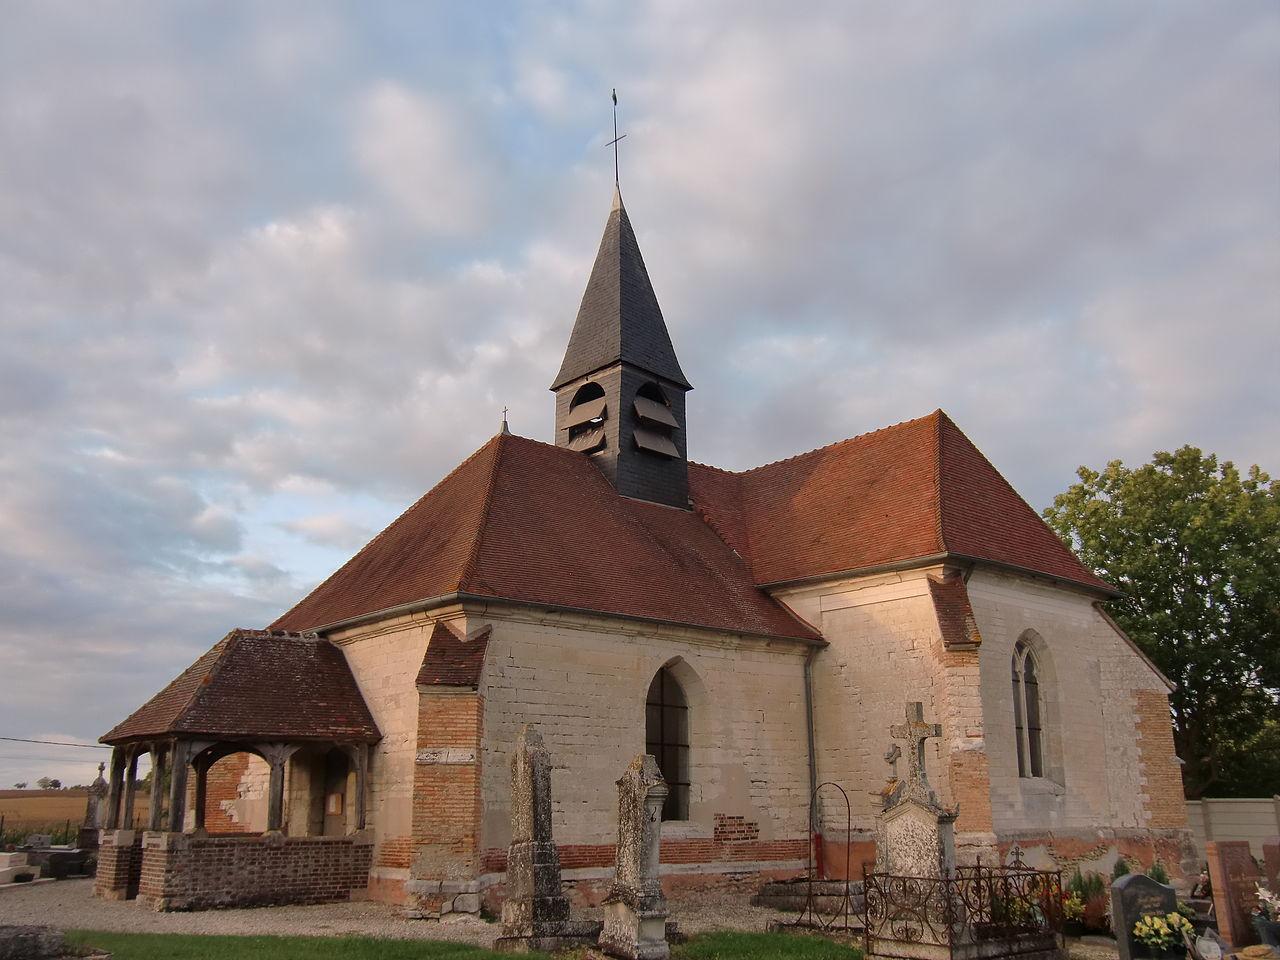 Ruvigny église.jpg